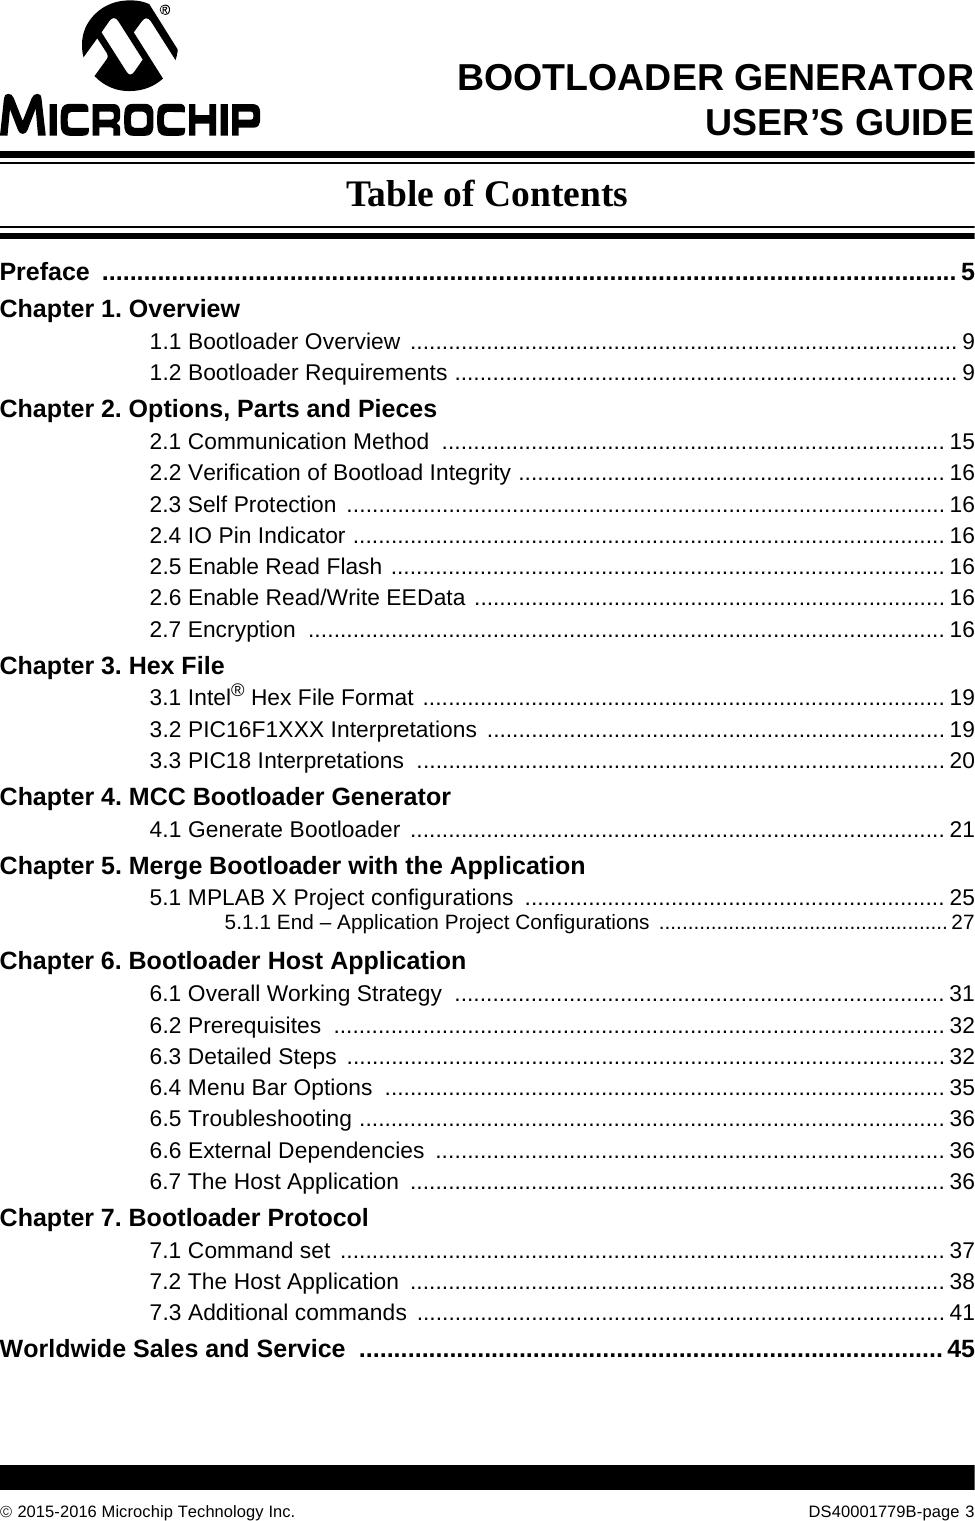 usermanual wiki/Document/bootloadergeneratorusergu